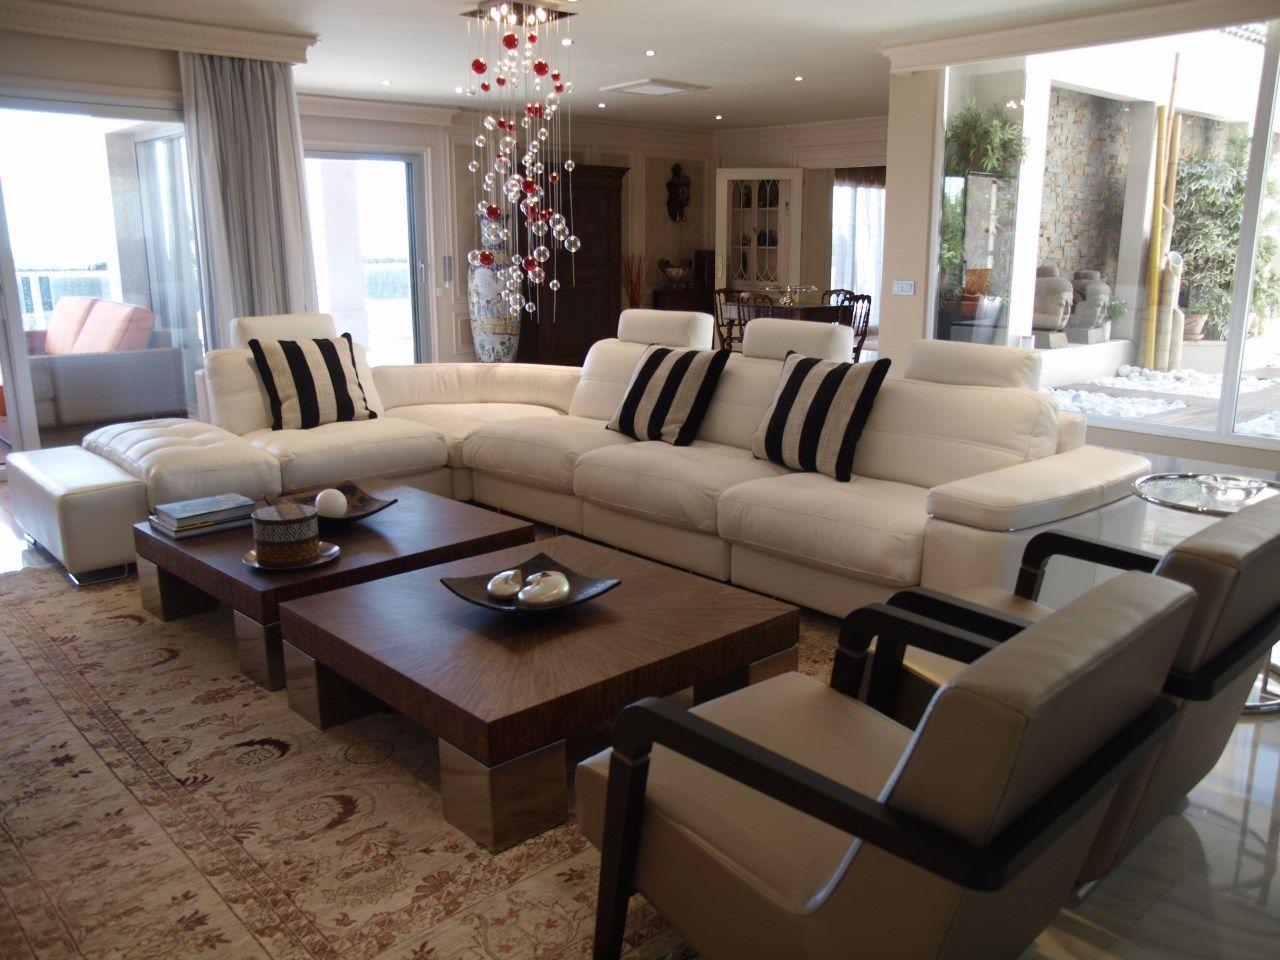 Elegante sal n de dise o minimalista moderno en tonos for Salon blanco y madera